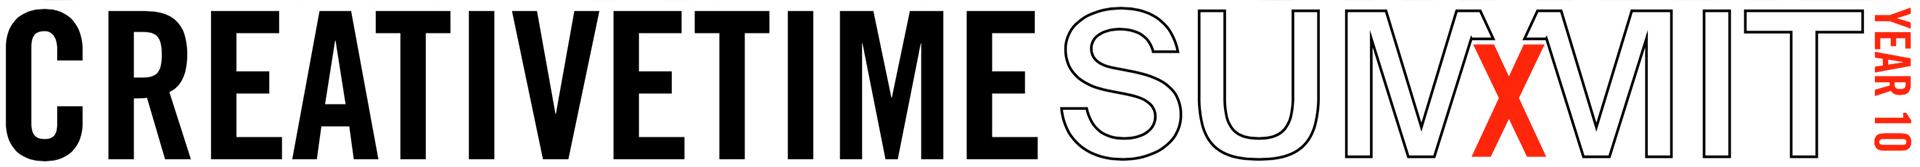 ct_summit_logo_2019.jpg